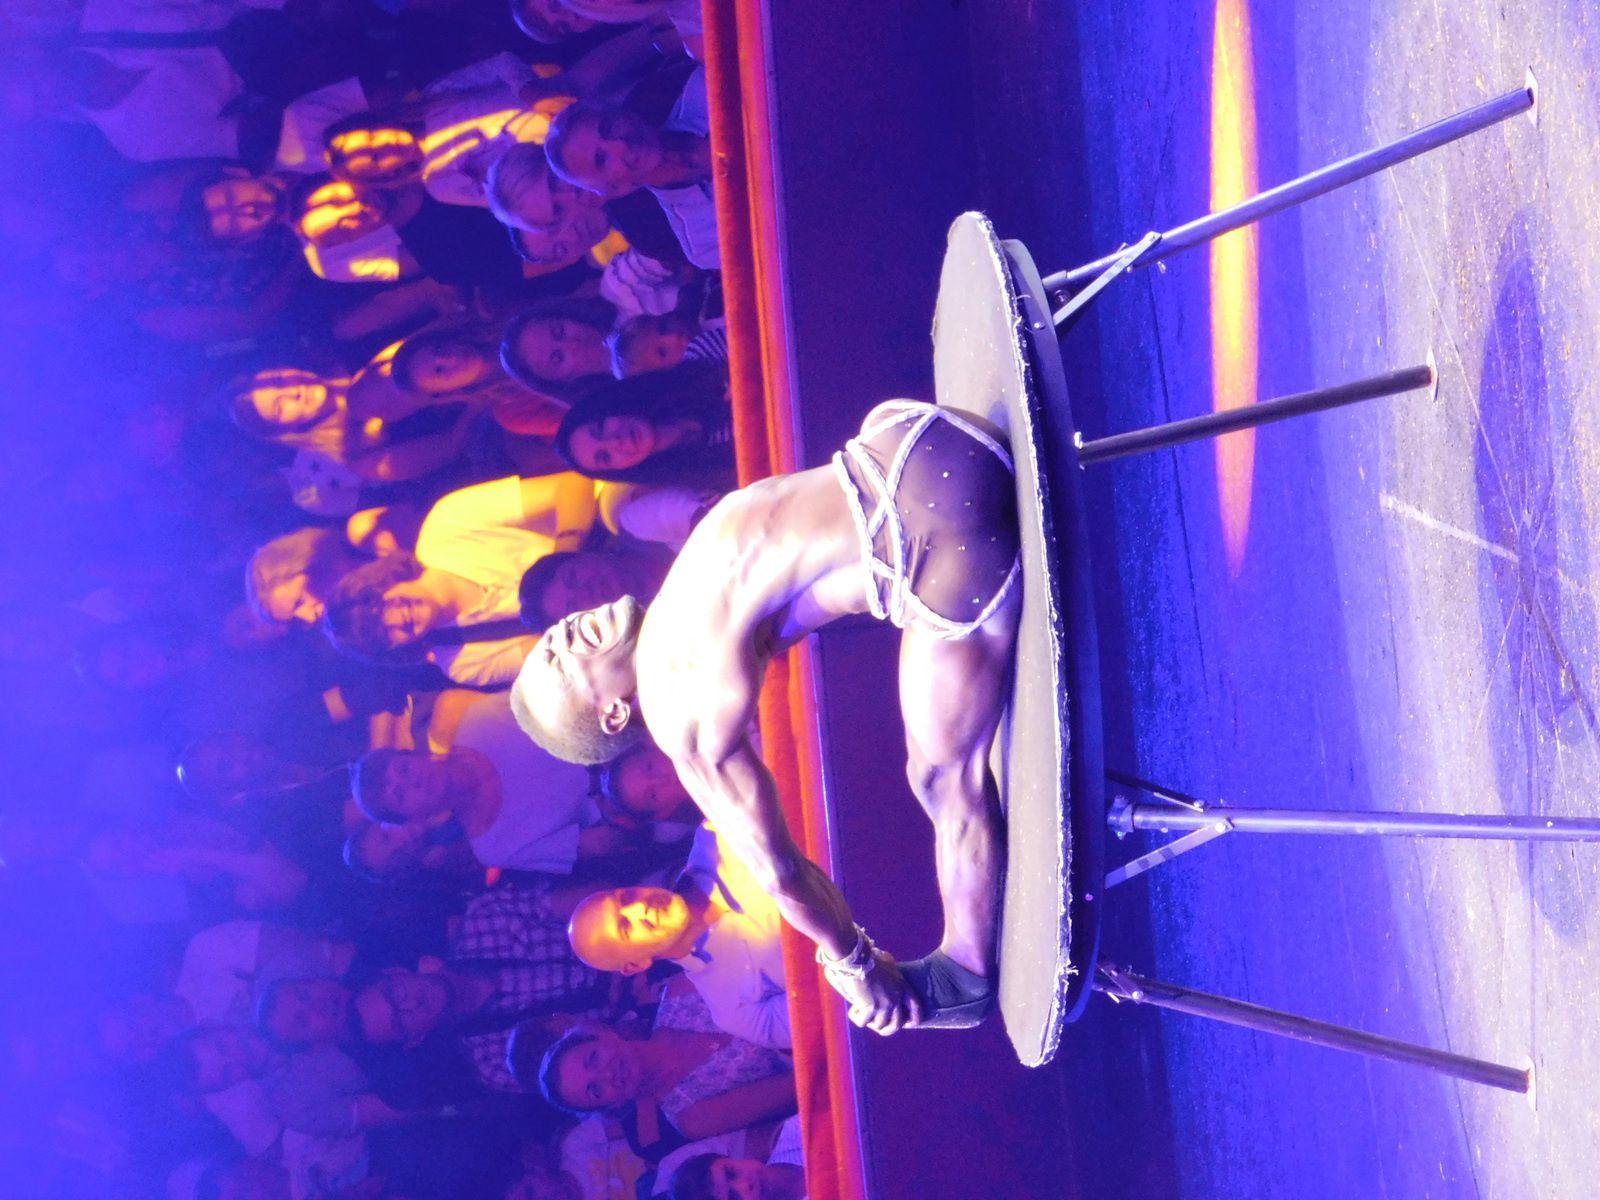 Sortie sympa : Cirque Arlete Gruss Août 2017 à Valbonne